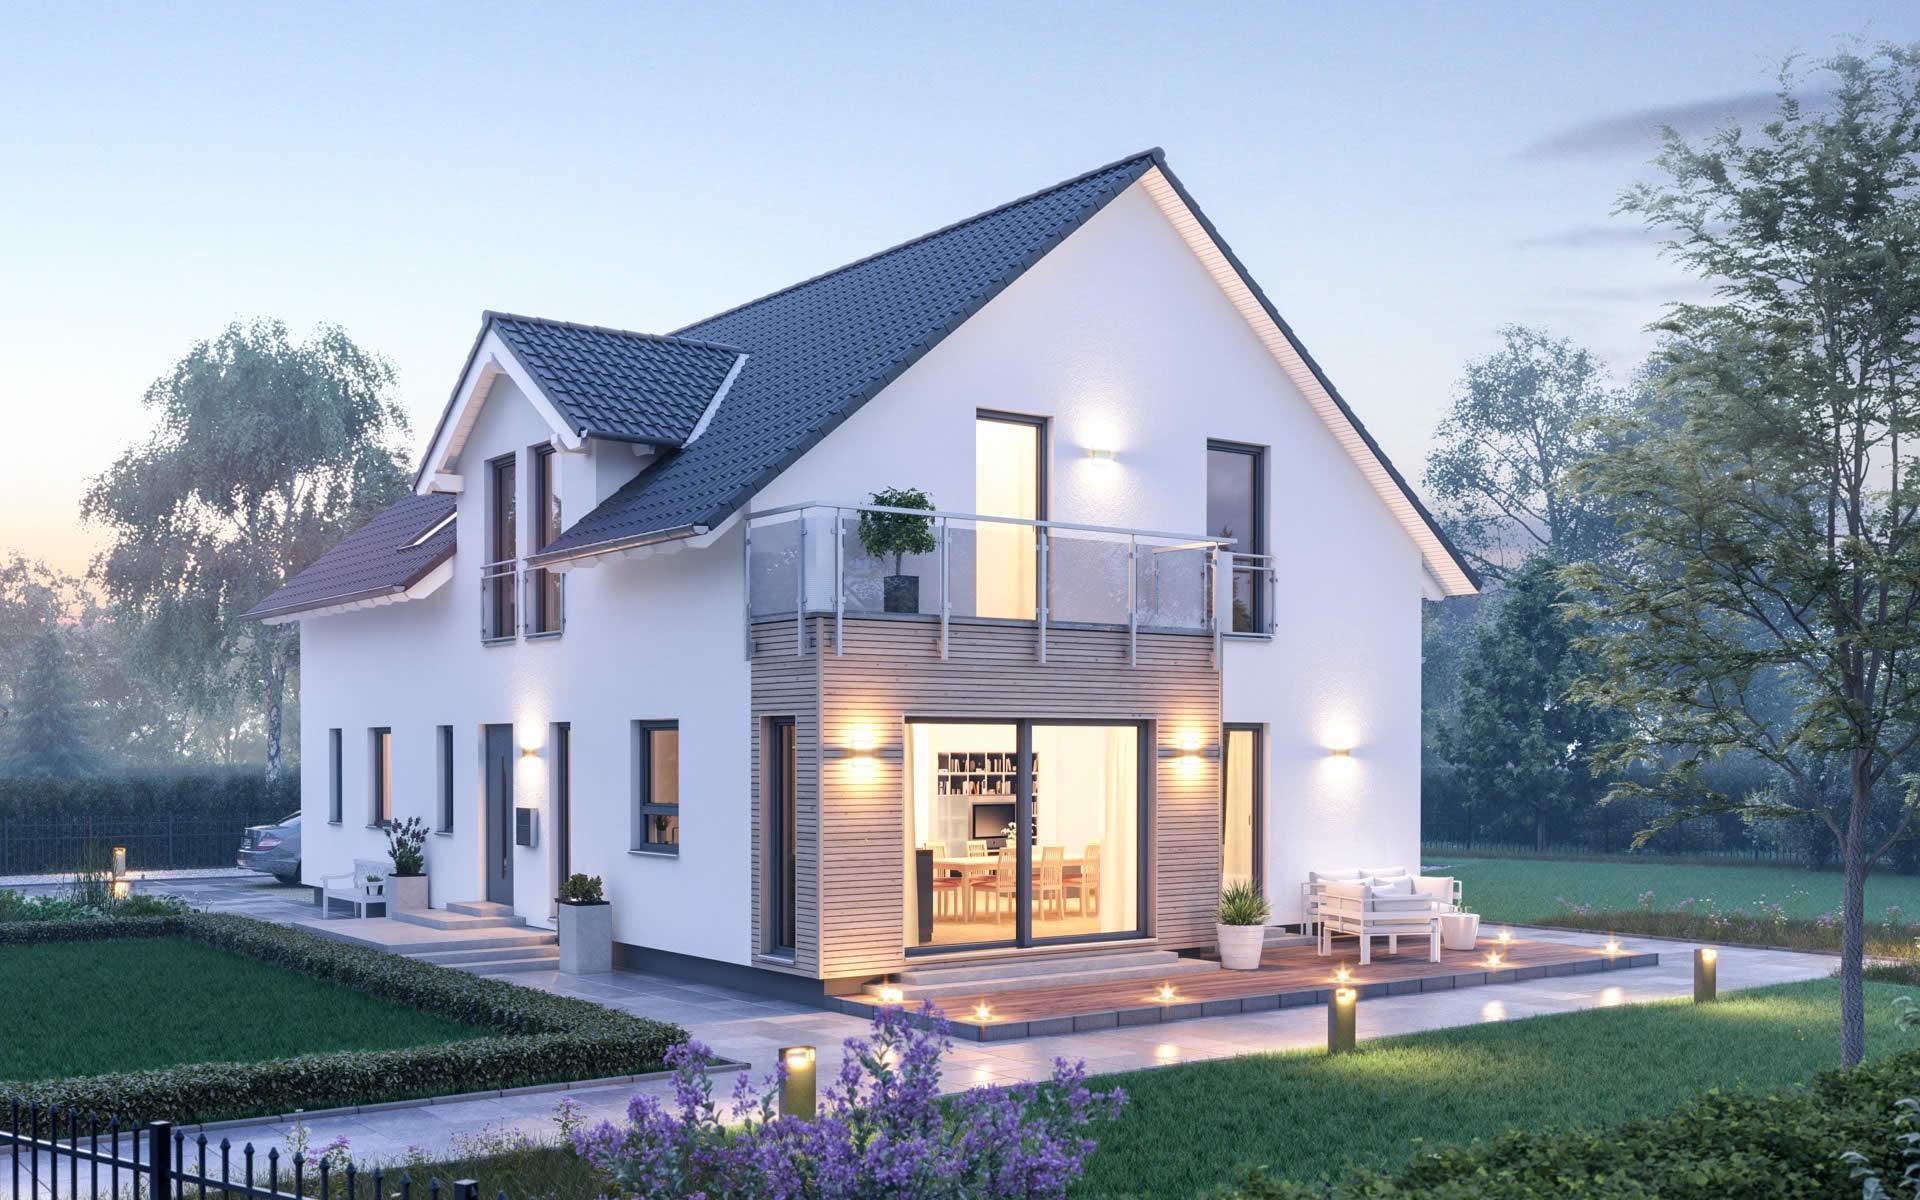 massa haus gmbh. Black Bedroom Furniture Sets. Home Design Ideas